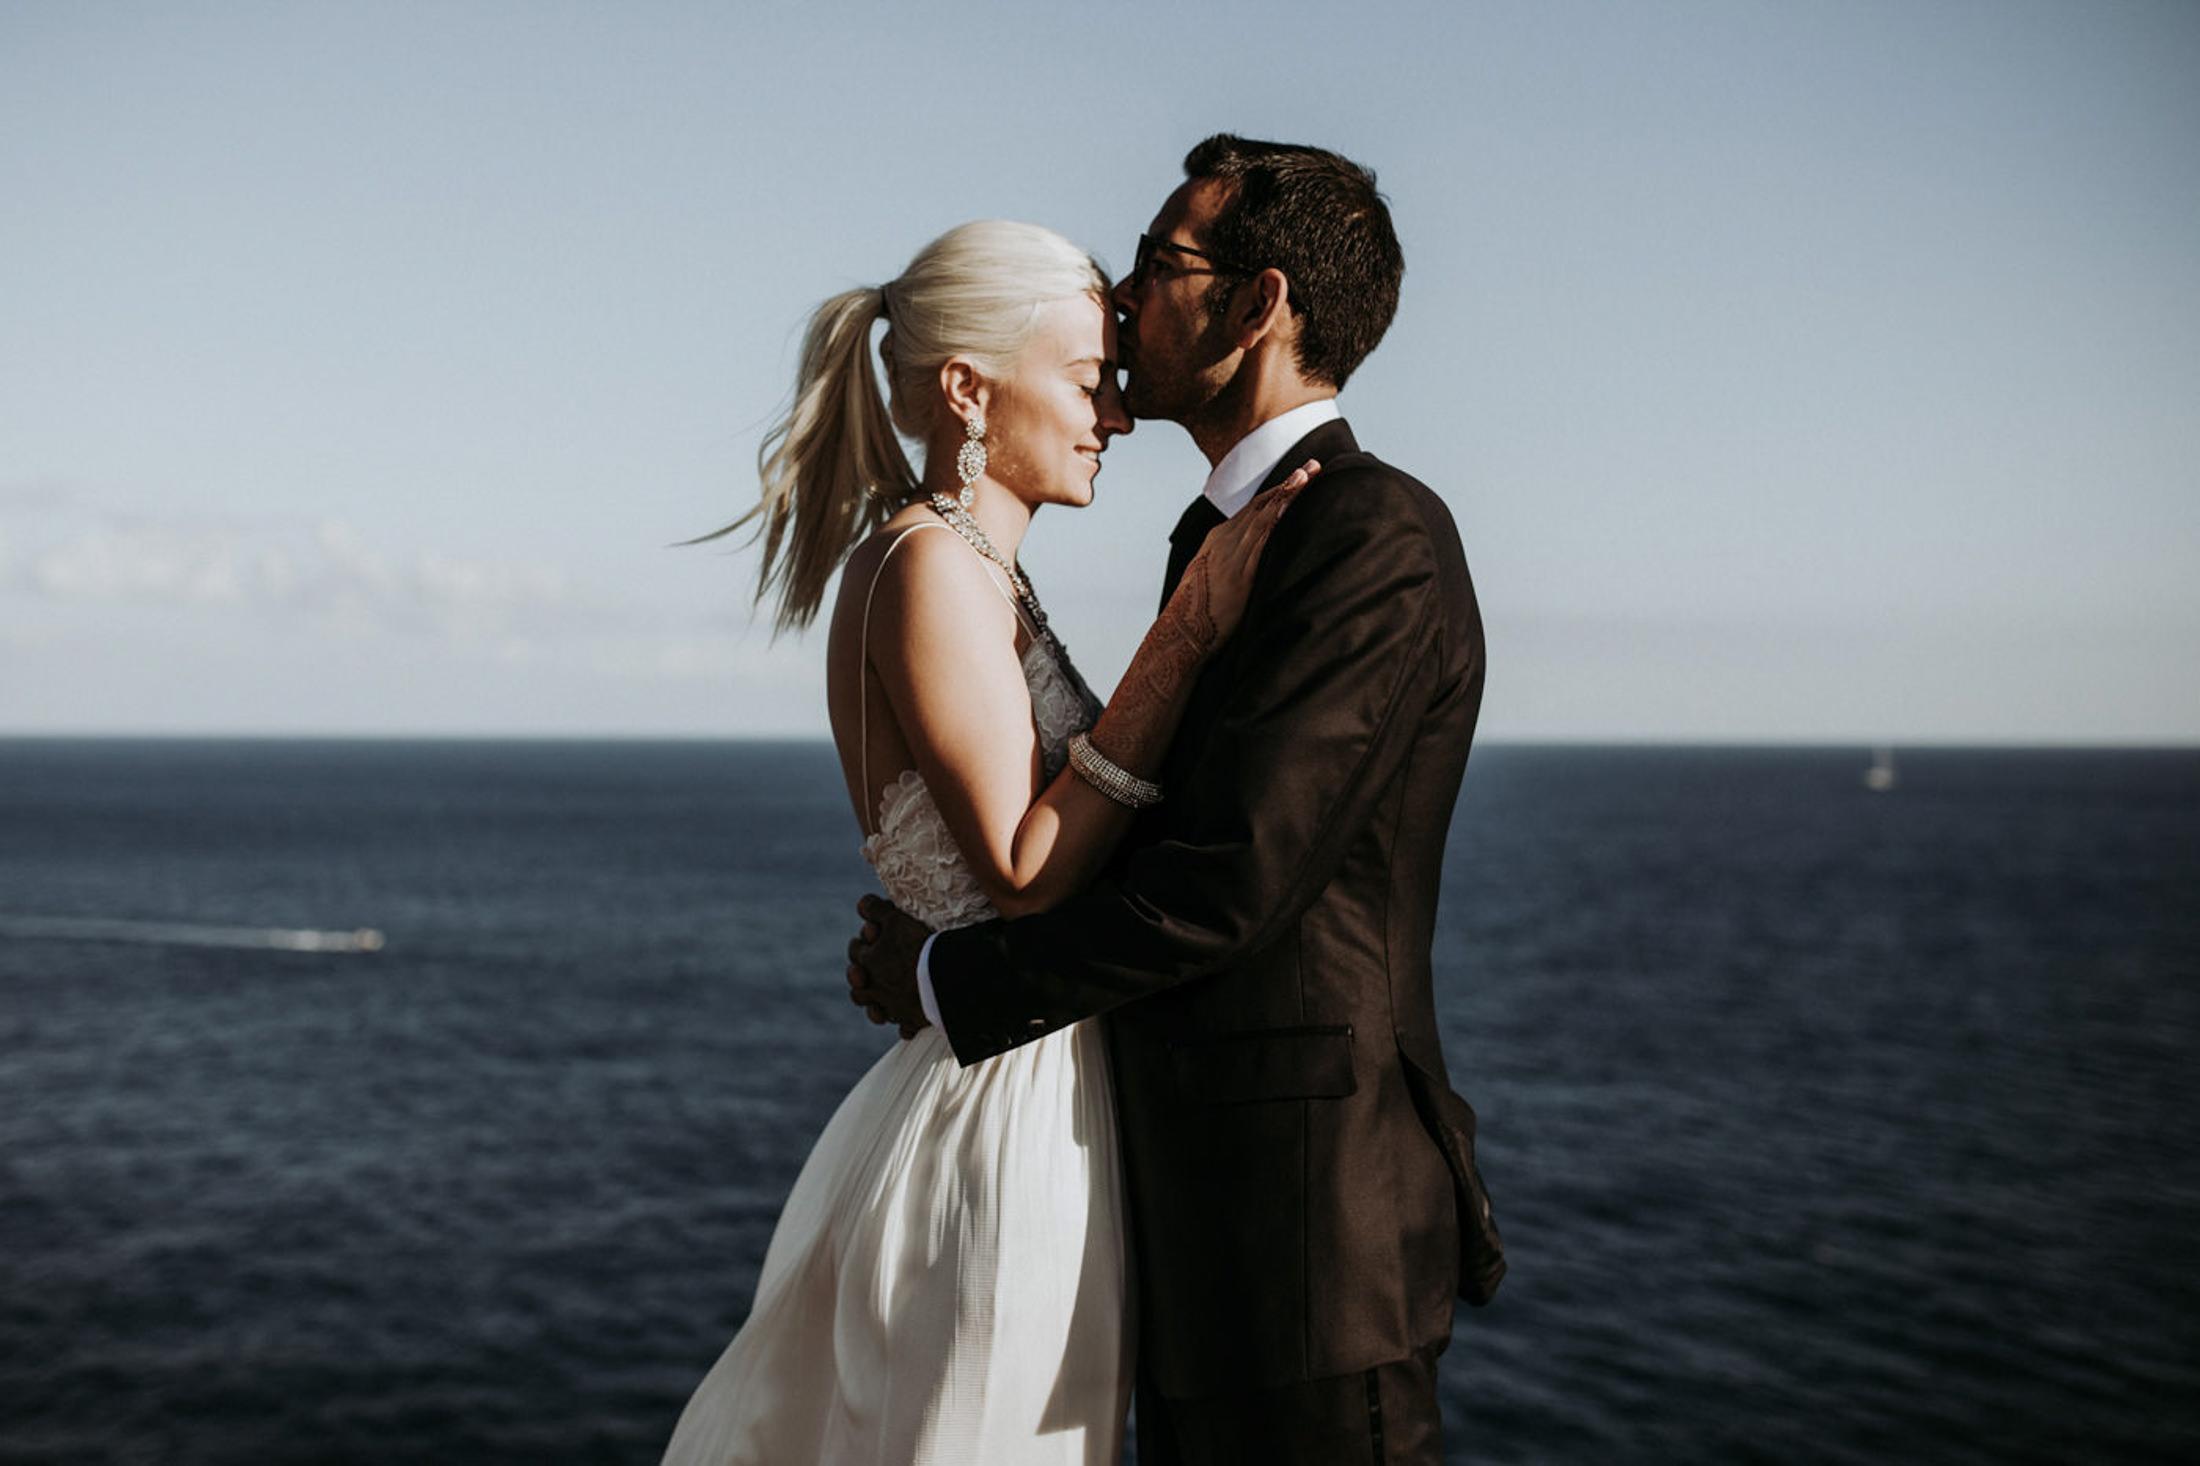 Wedding_Photographer_Mallorca_Daniela-Marquardt_Photography_New_York_Iceland_Tuscany_Santorini_Portugal_Austria_Bavaria_Elopement_Hochzeitsfotograf_AntjeRajat2_91